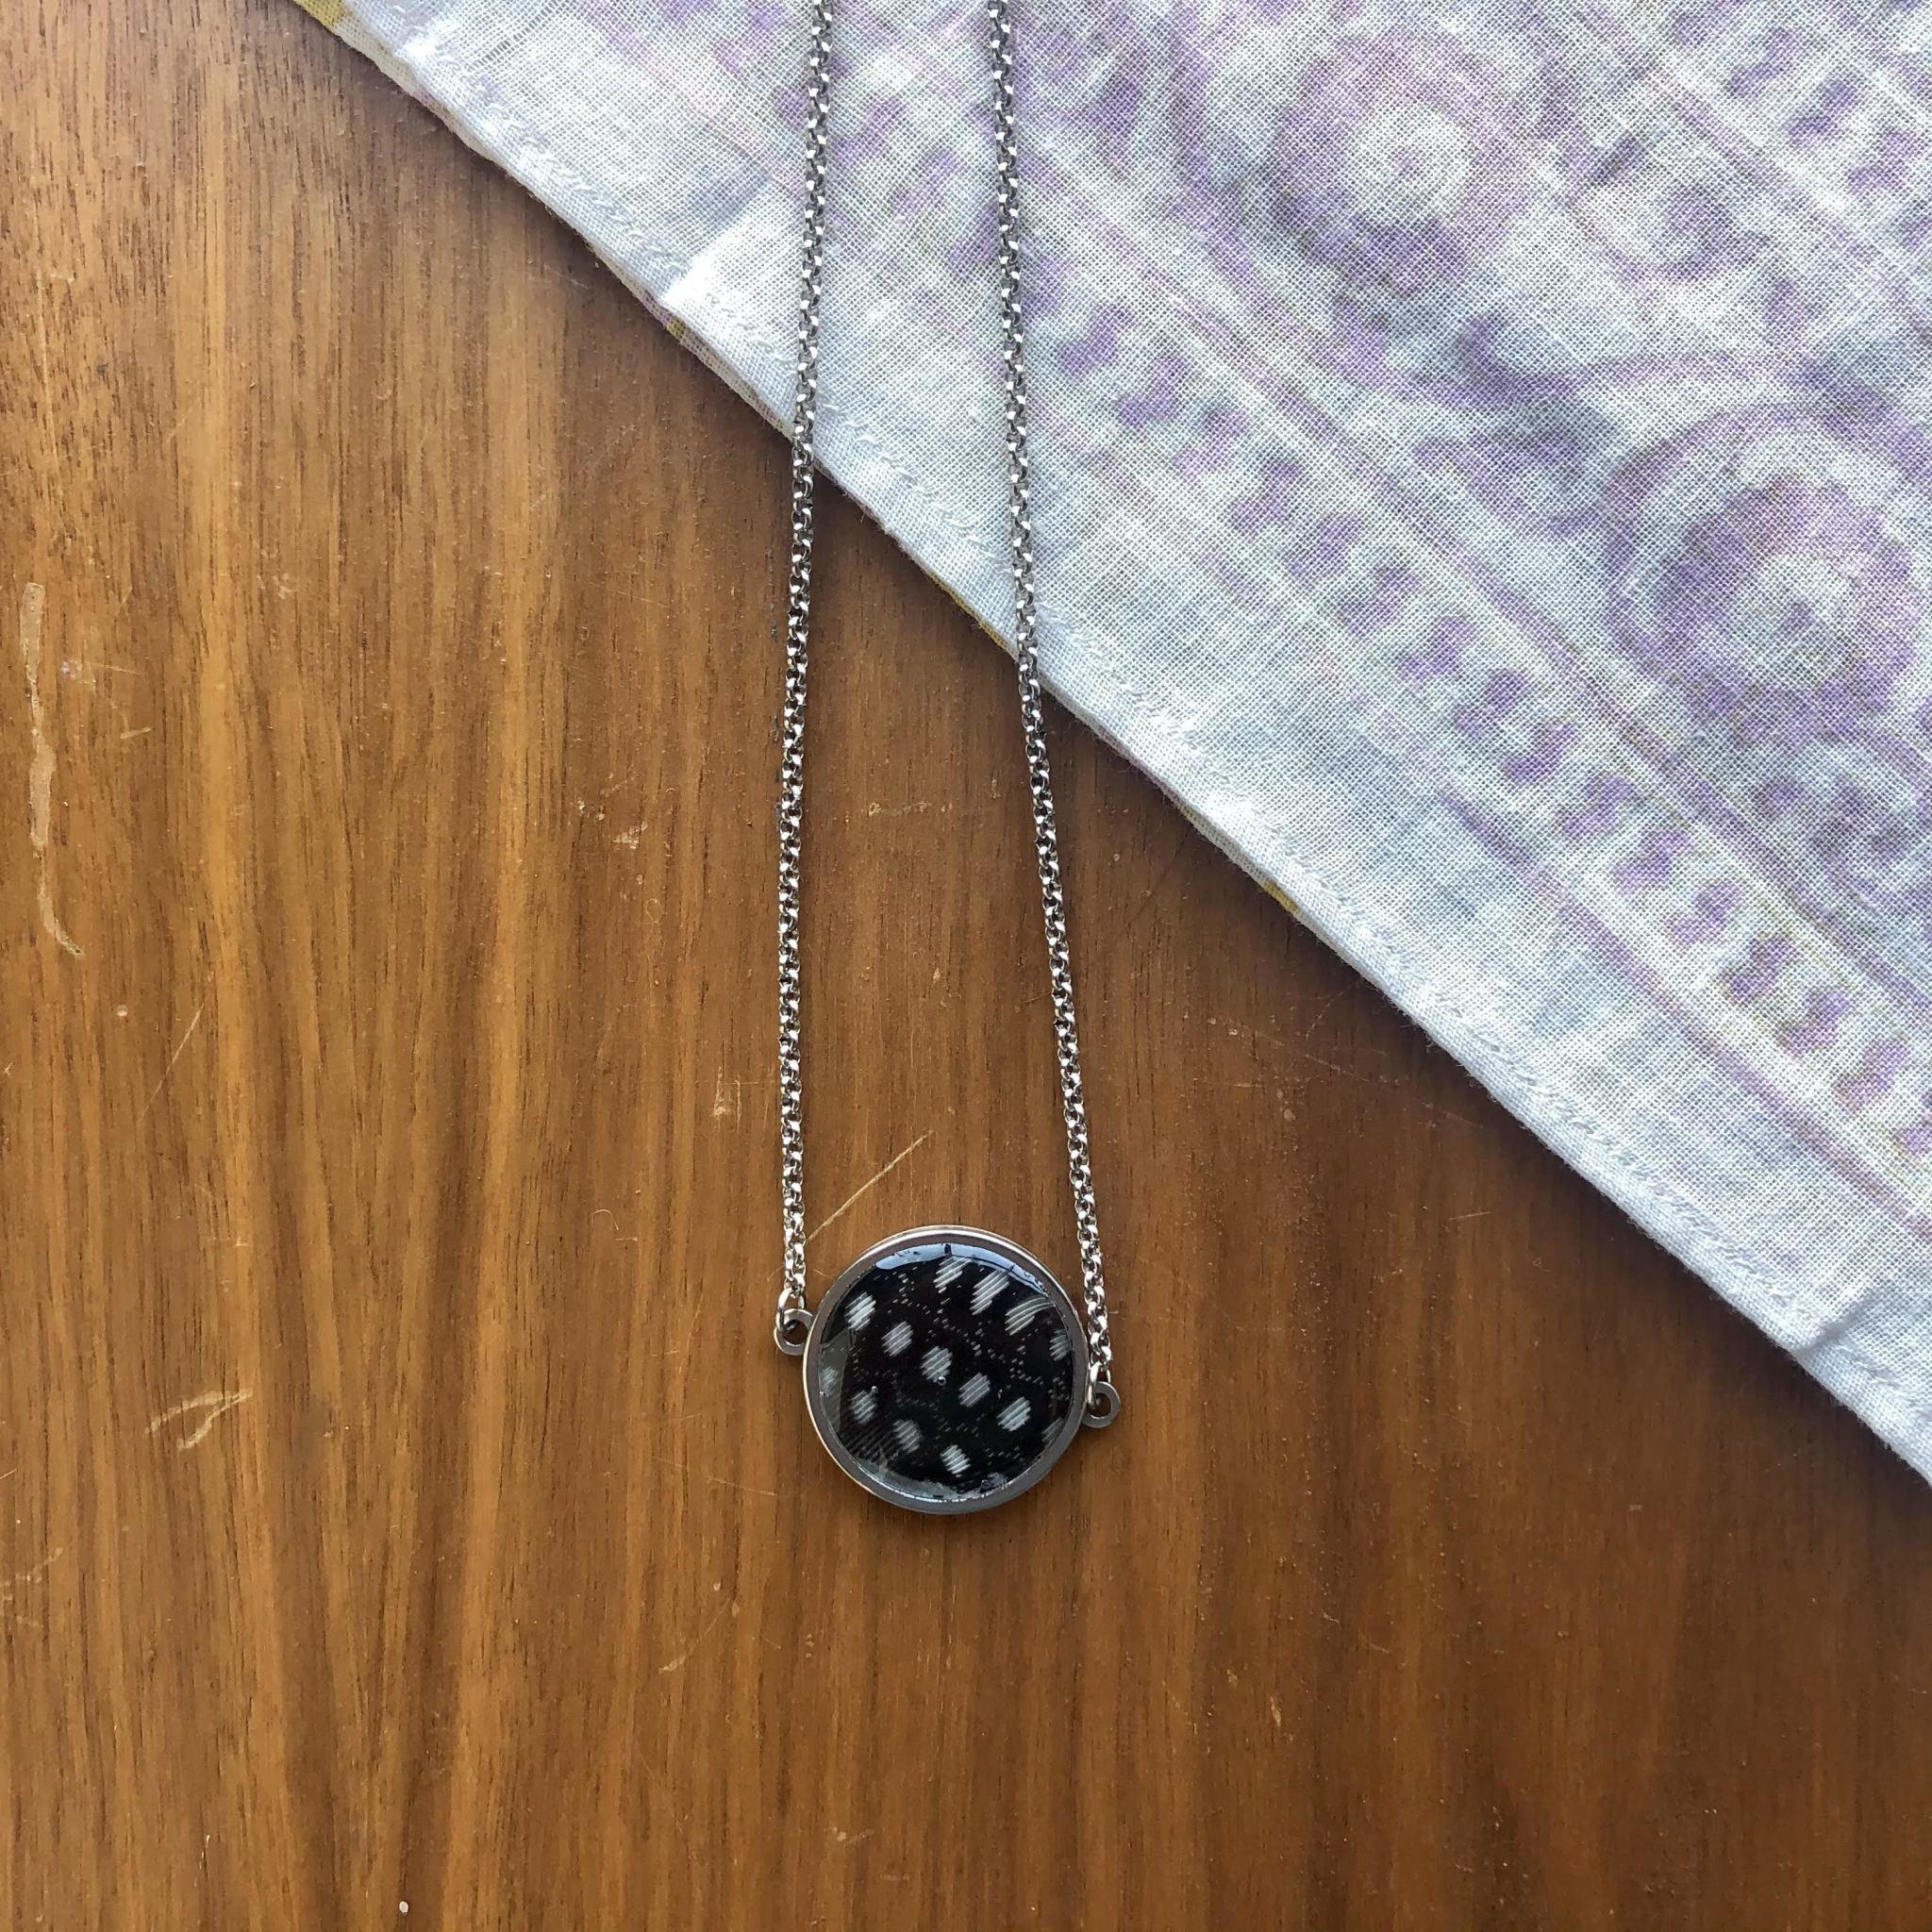 Ziggywear Guinea Feather Chain Necklace